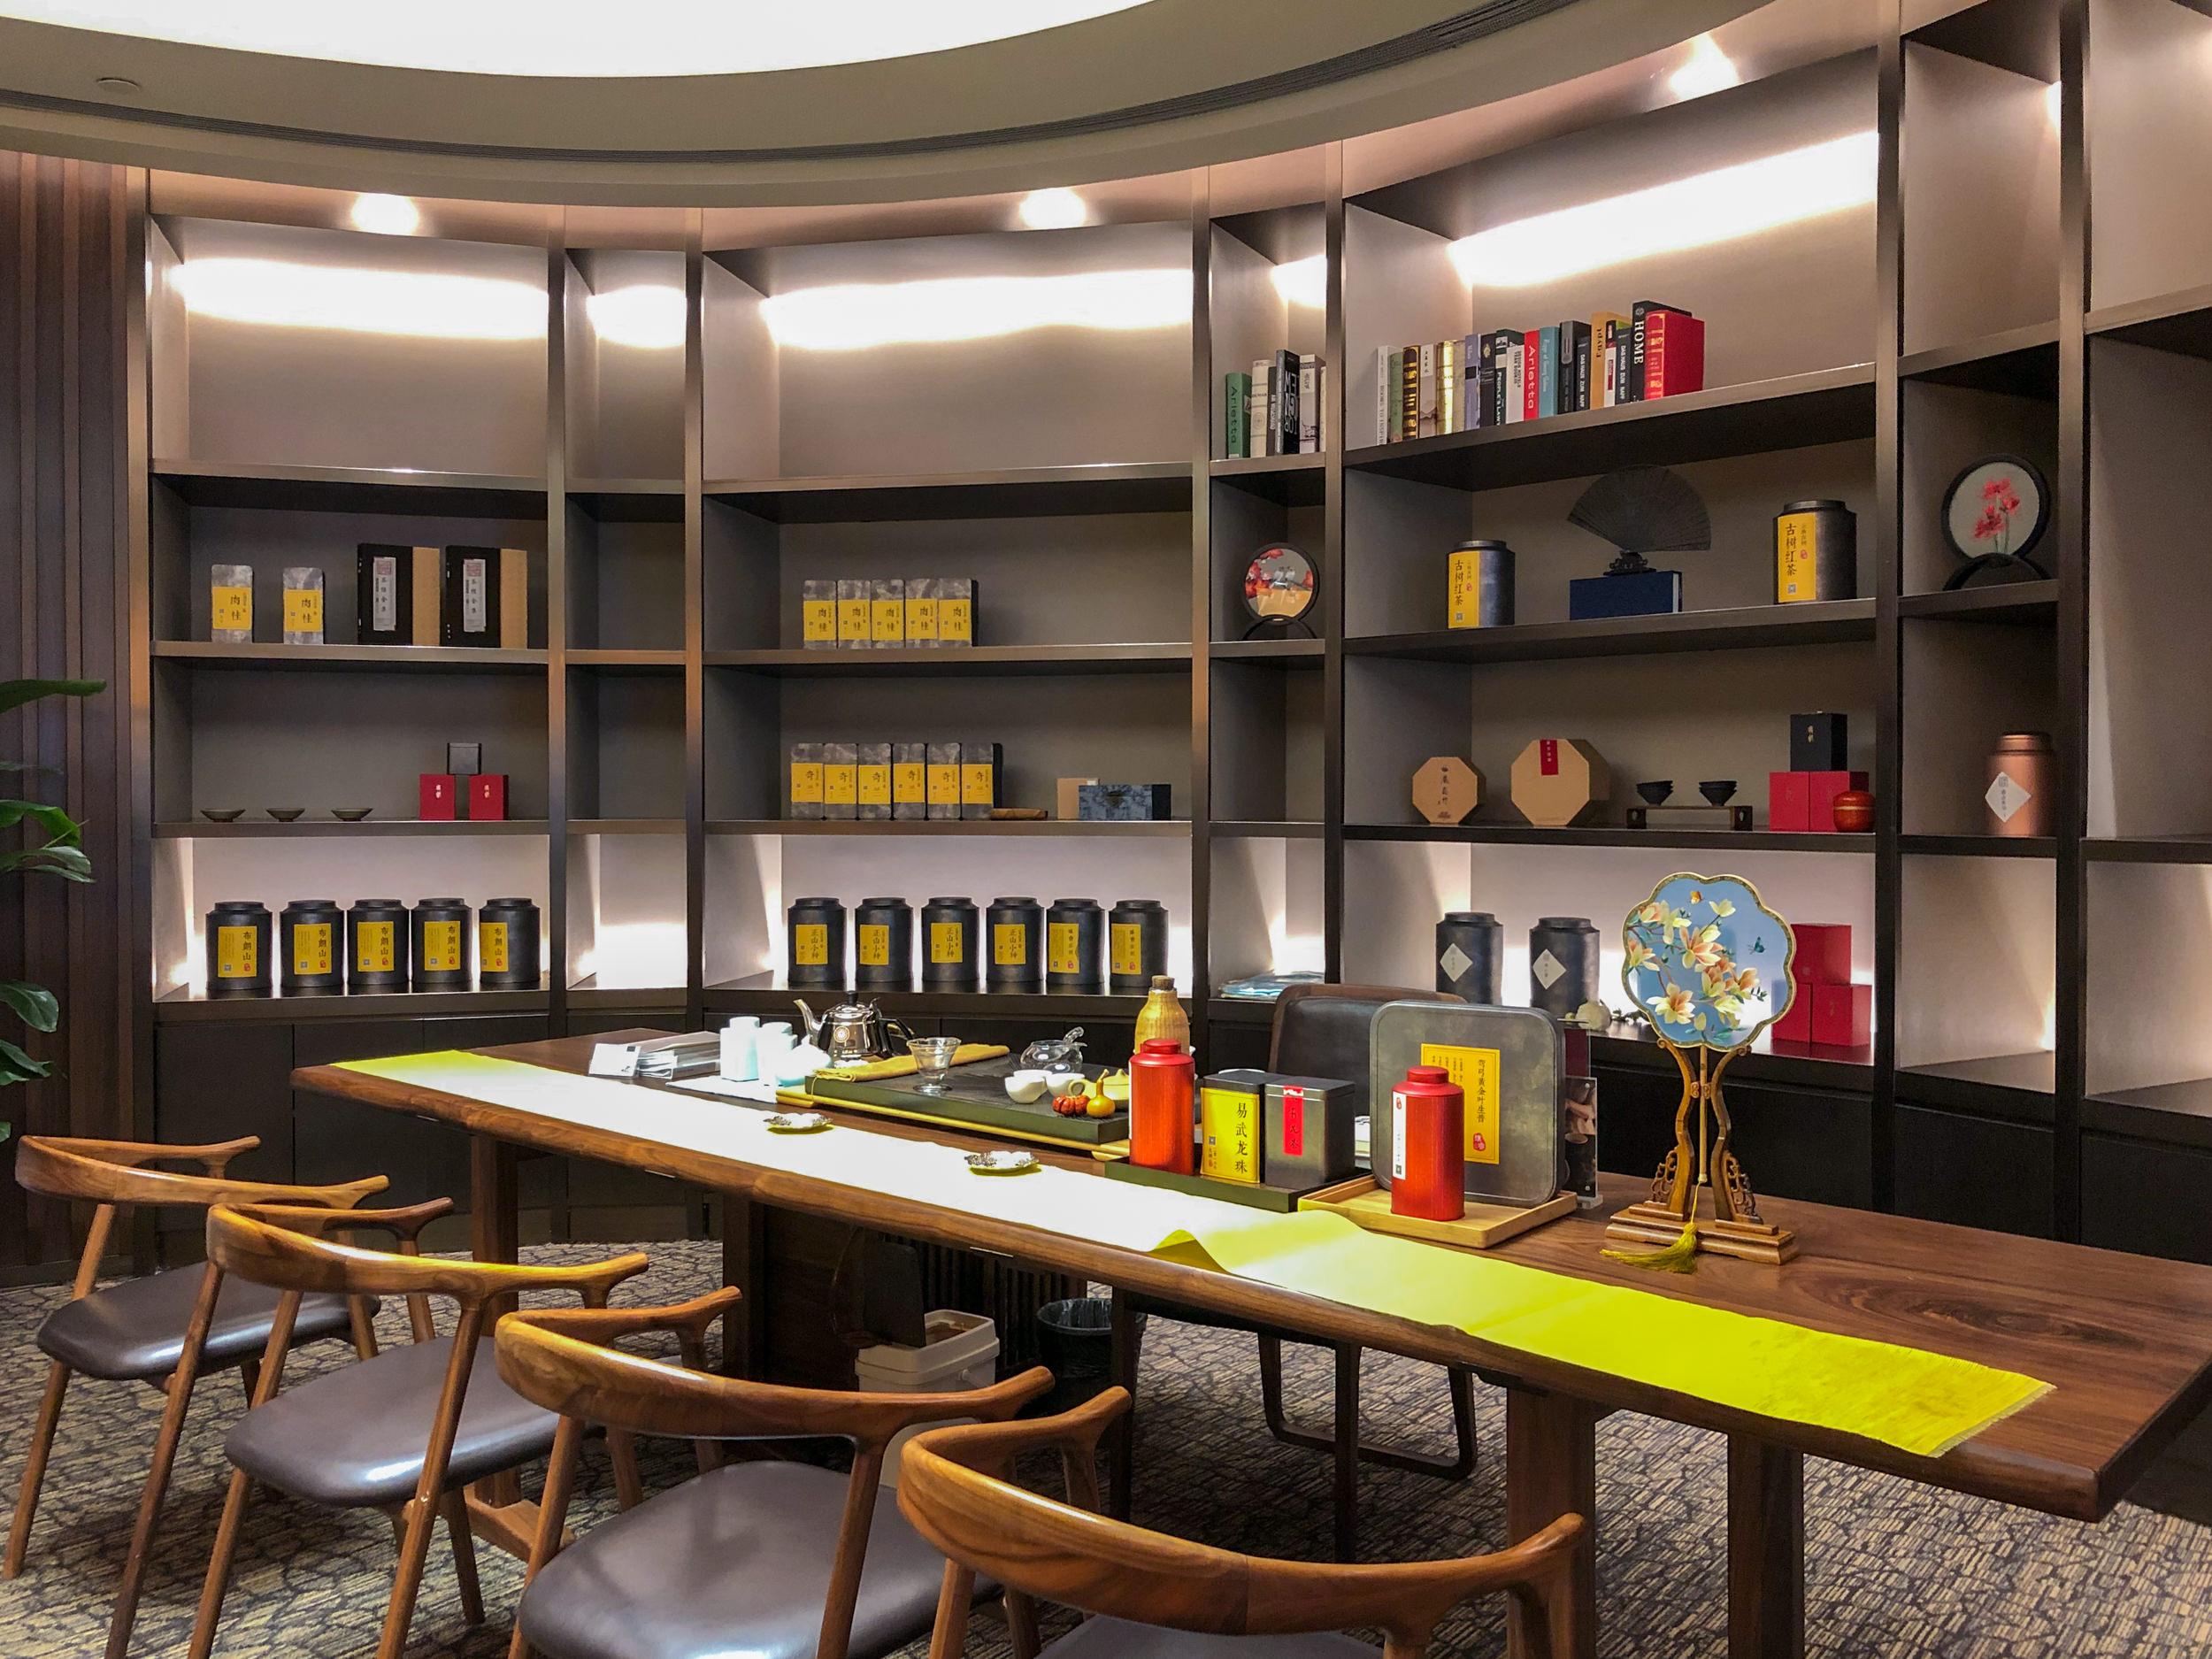 Tea Tasting Room  Premium Lounge (Terminal 2) - Guangzhou Baiyun International Airport (CAN)